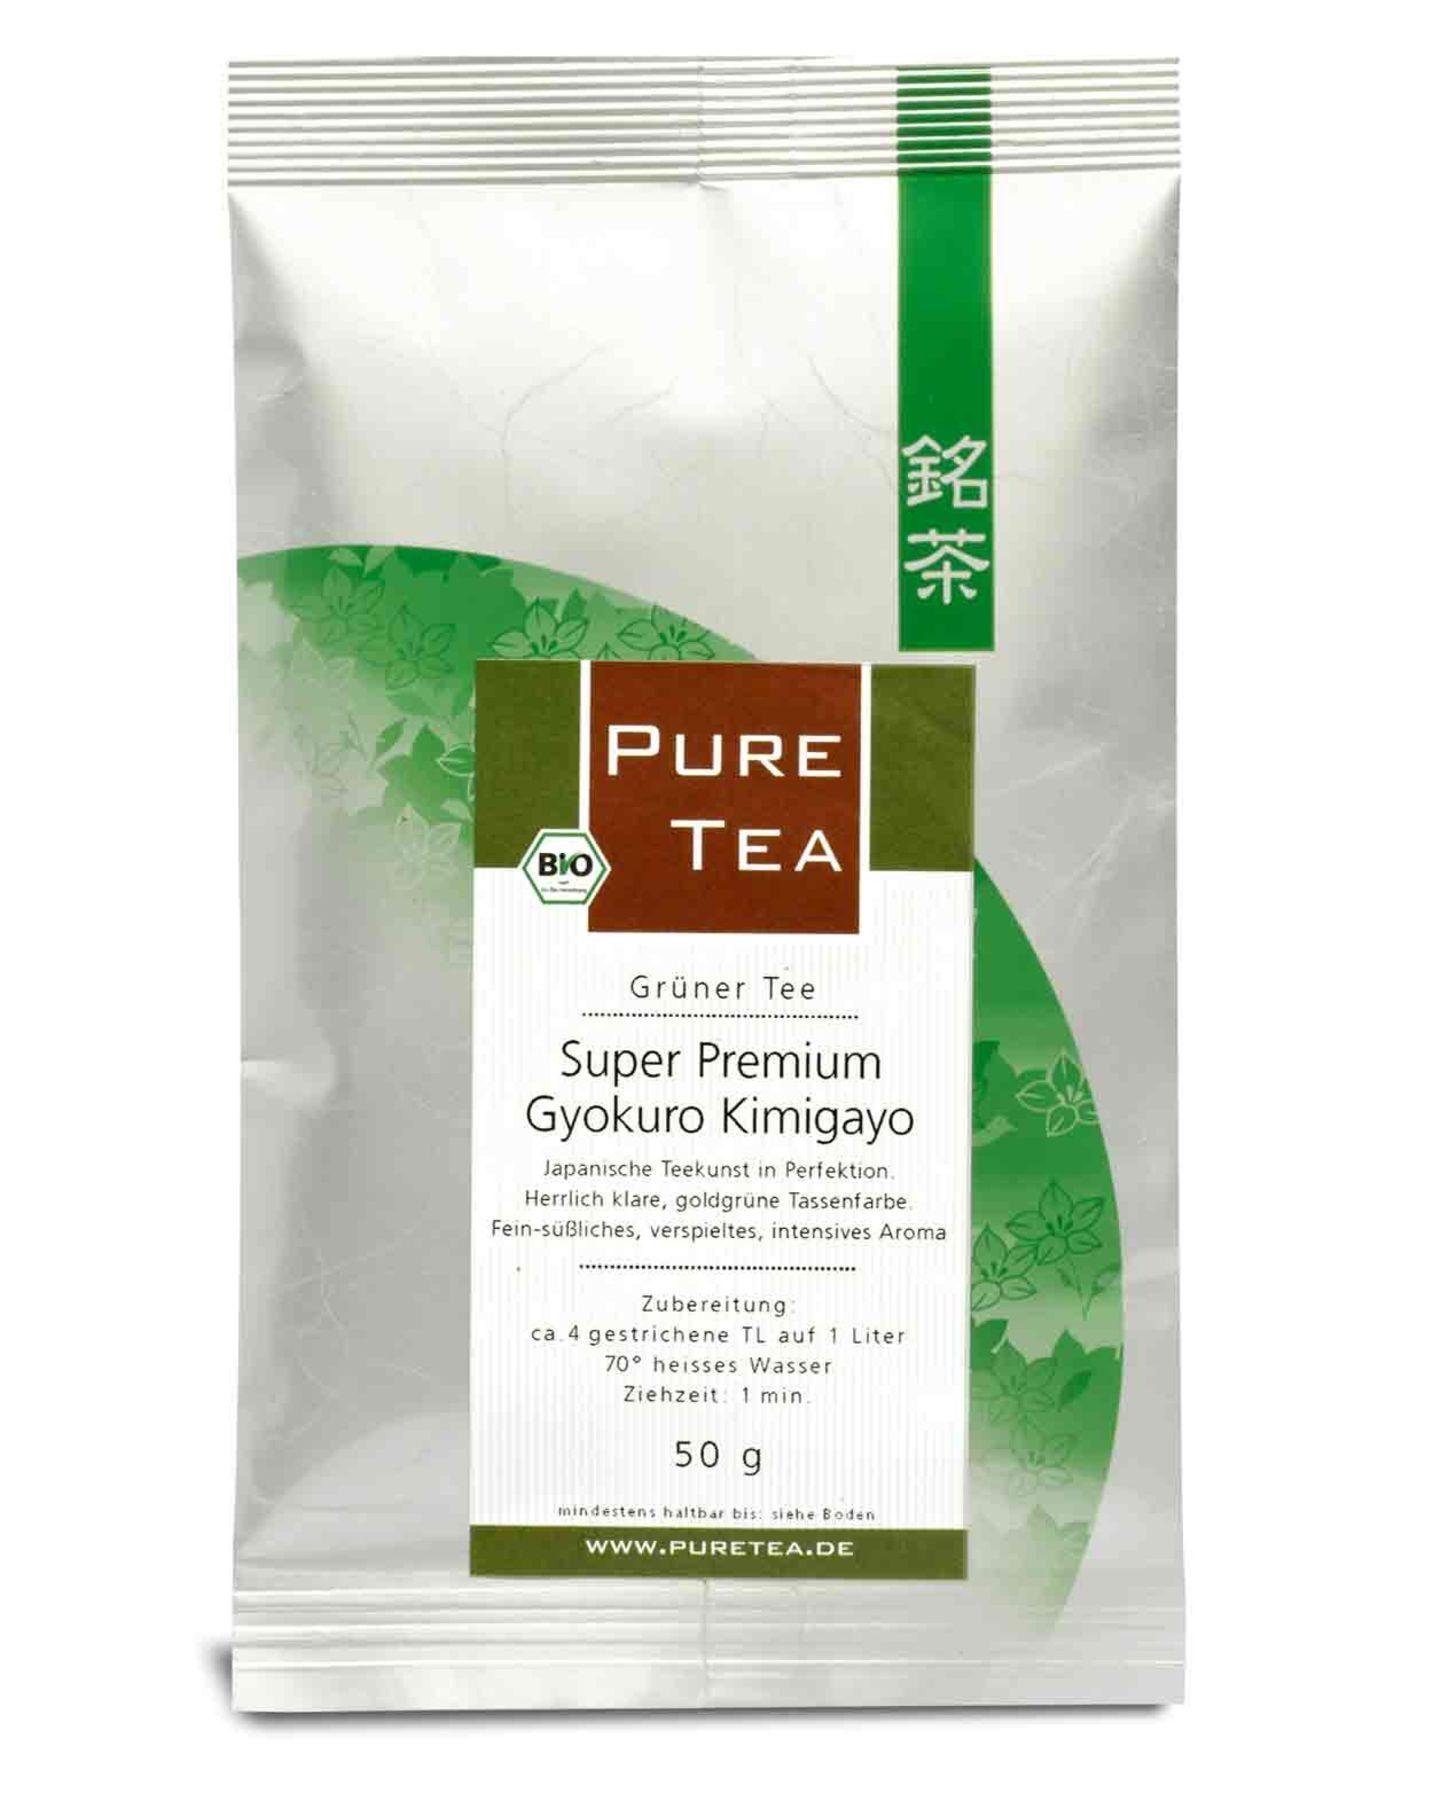 Super Premium Gyokuro Kimigayo von Pure Tea